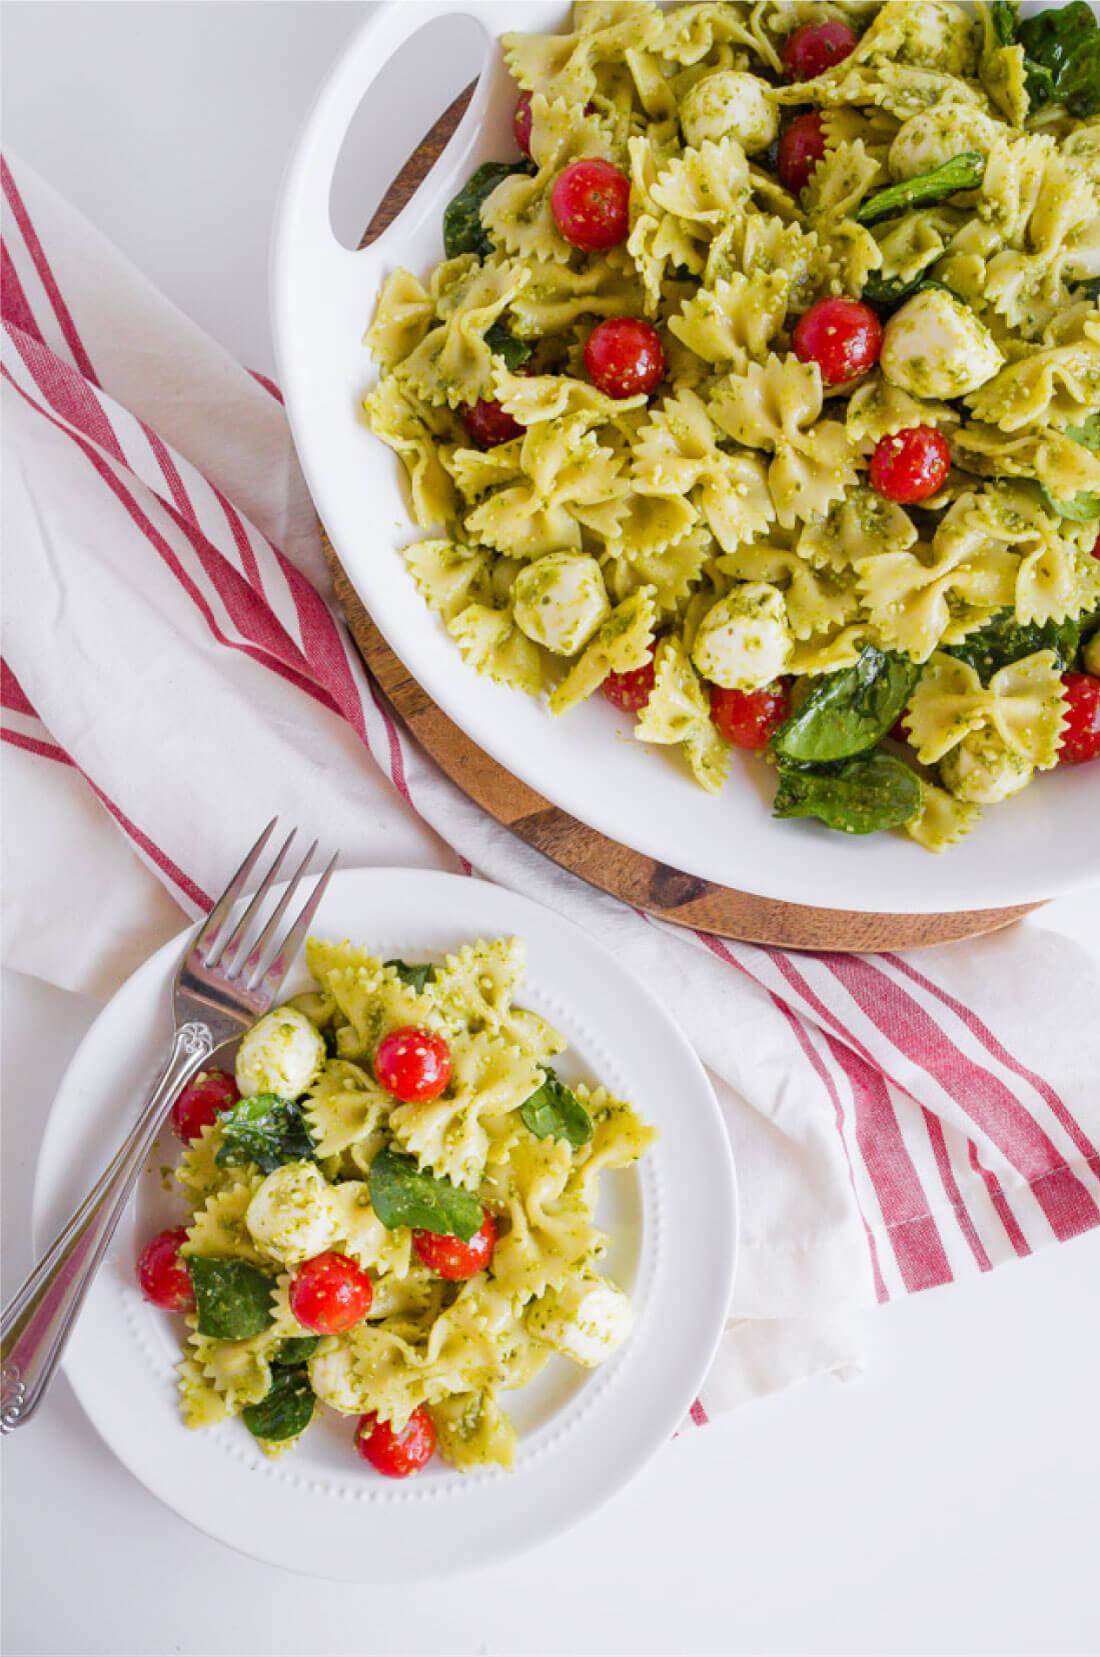 Pesto Pasta Salad Recipe - a take on an old classic. This pasta recipe is so good! www.thirtyhandmadedays.com